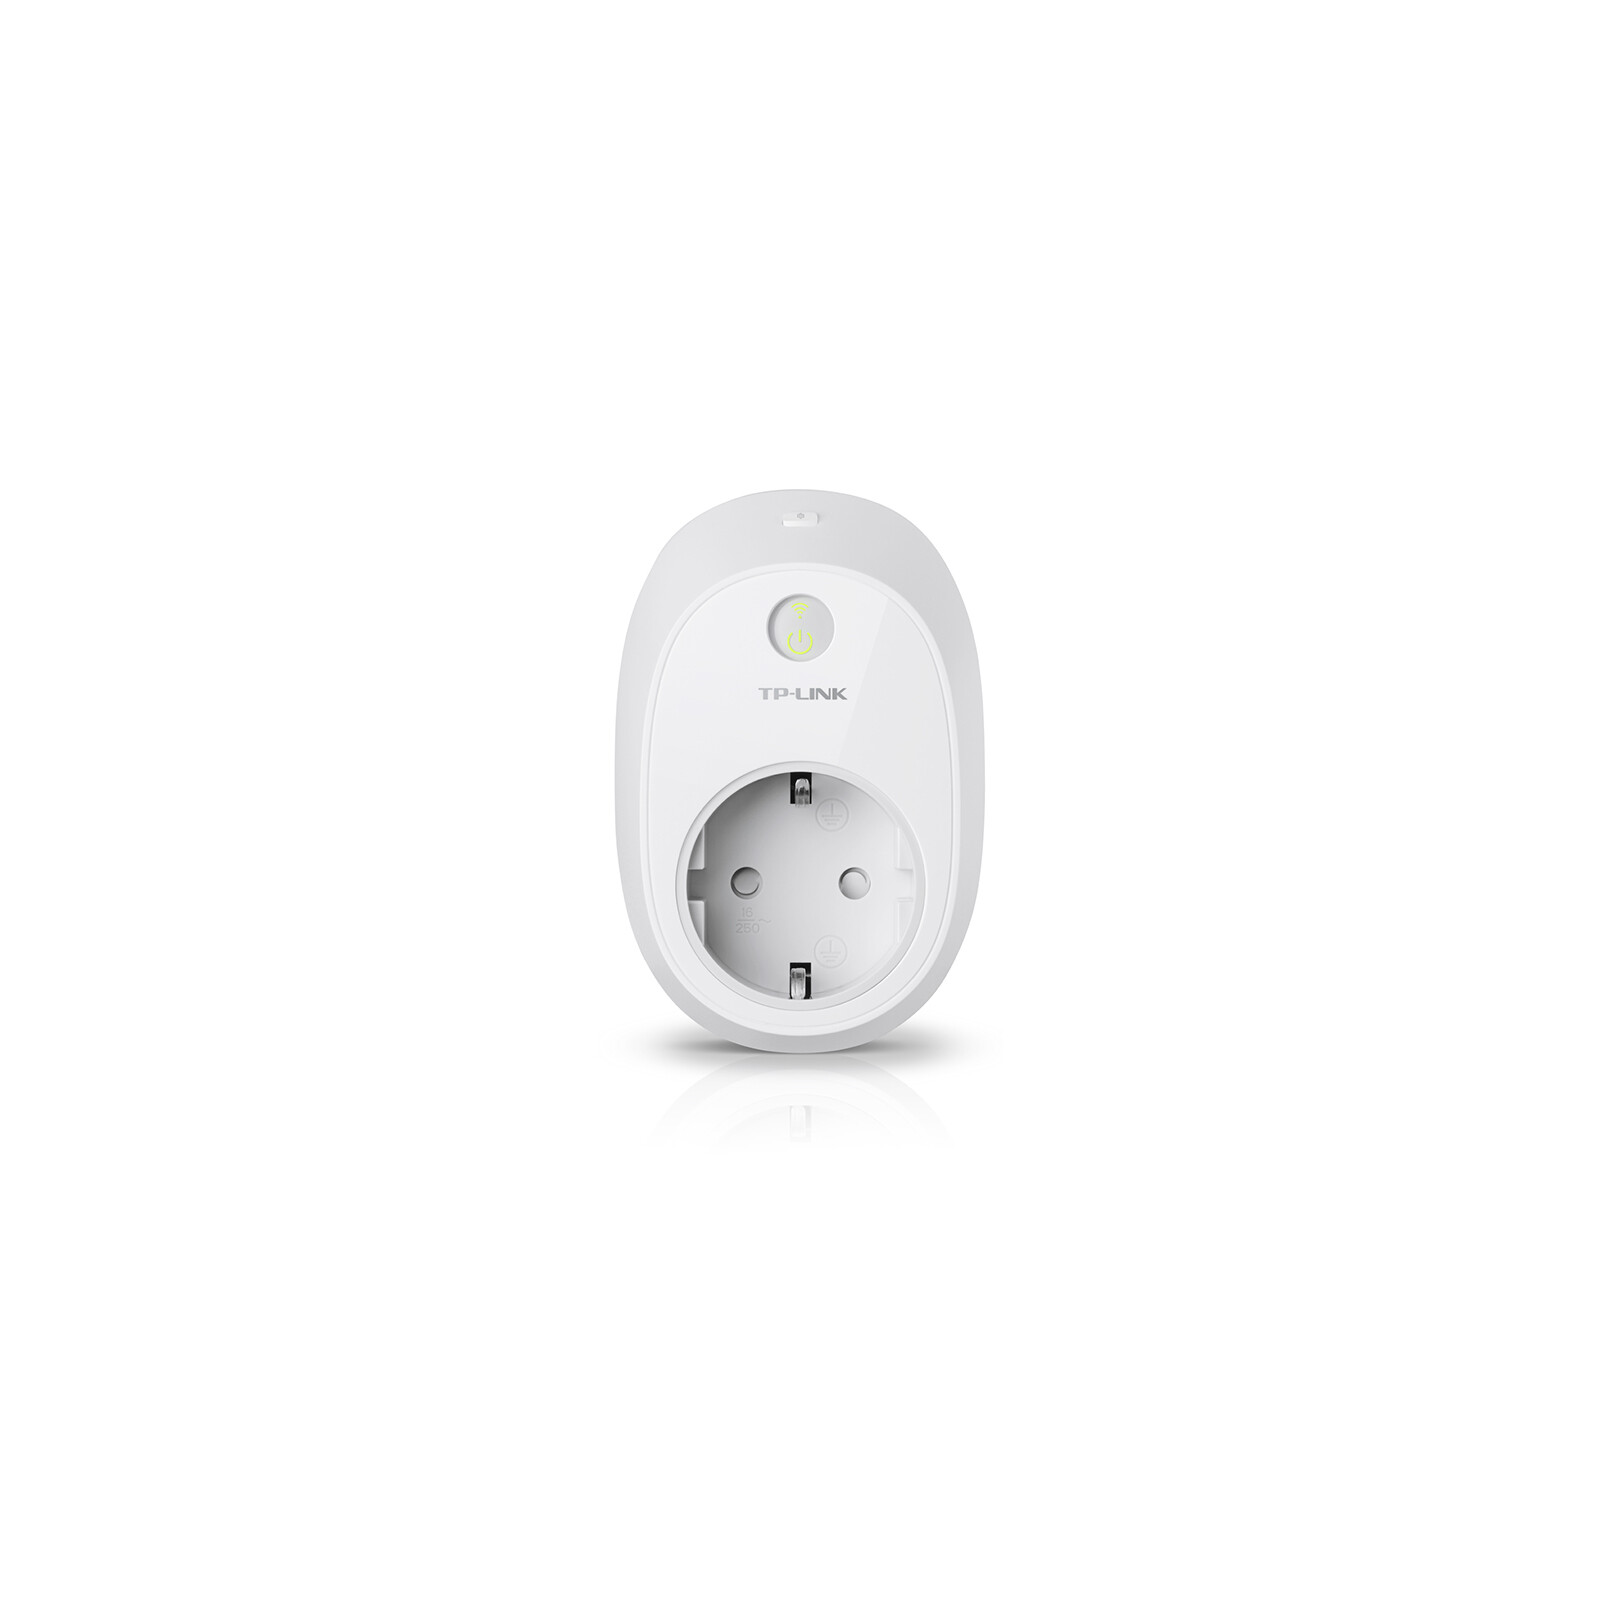 TP-Link HS110 Wifi Smart Plug